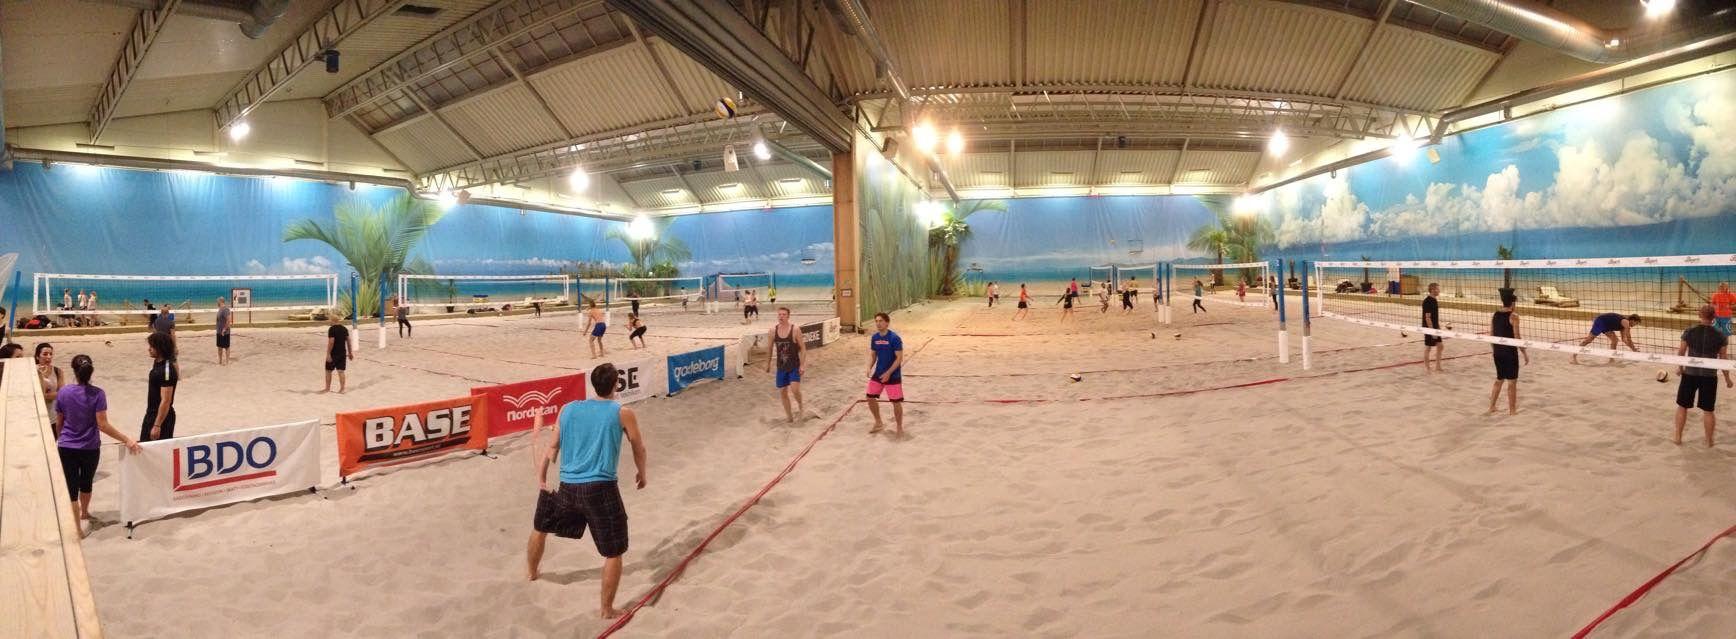 Sefa Sand Volleyball Indoor Center Biggest Bvb Complex Beach Volleyball Court Beach Volleyball Indoor Beach